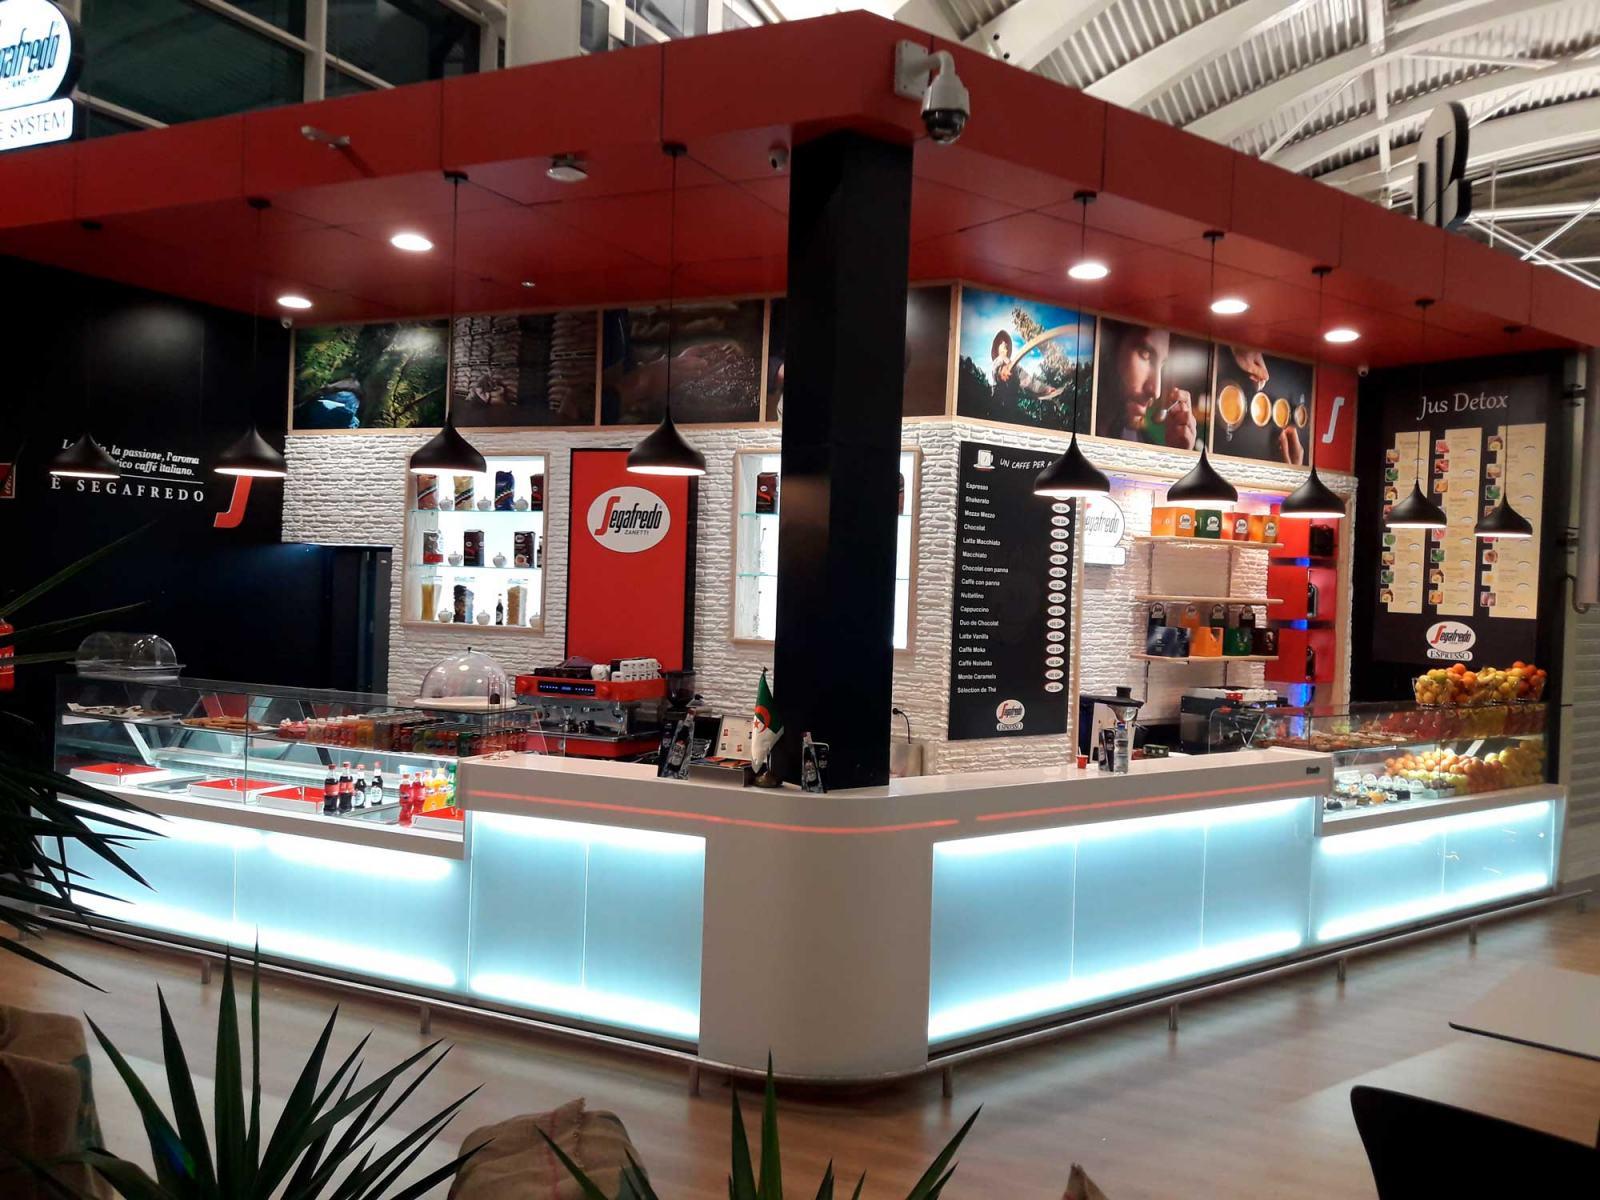 Agencement café segafredo coffee system